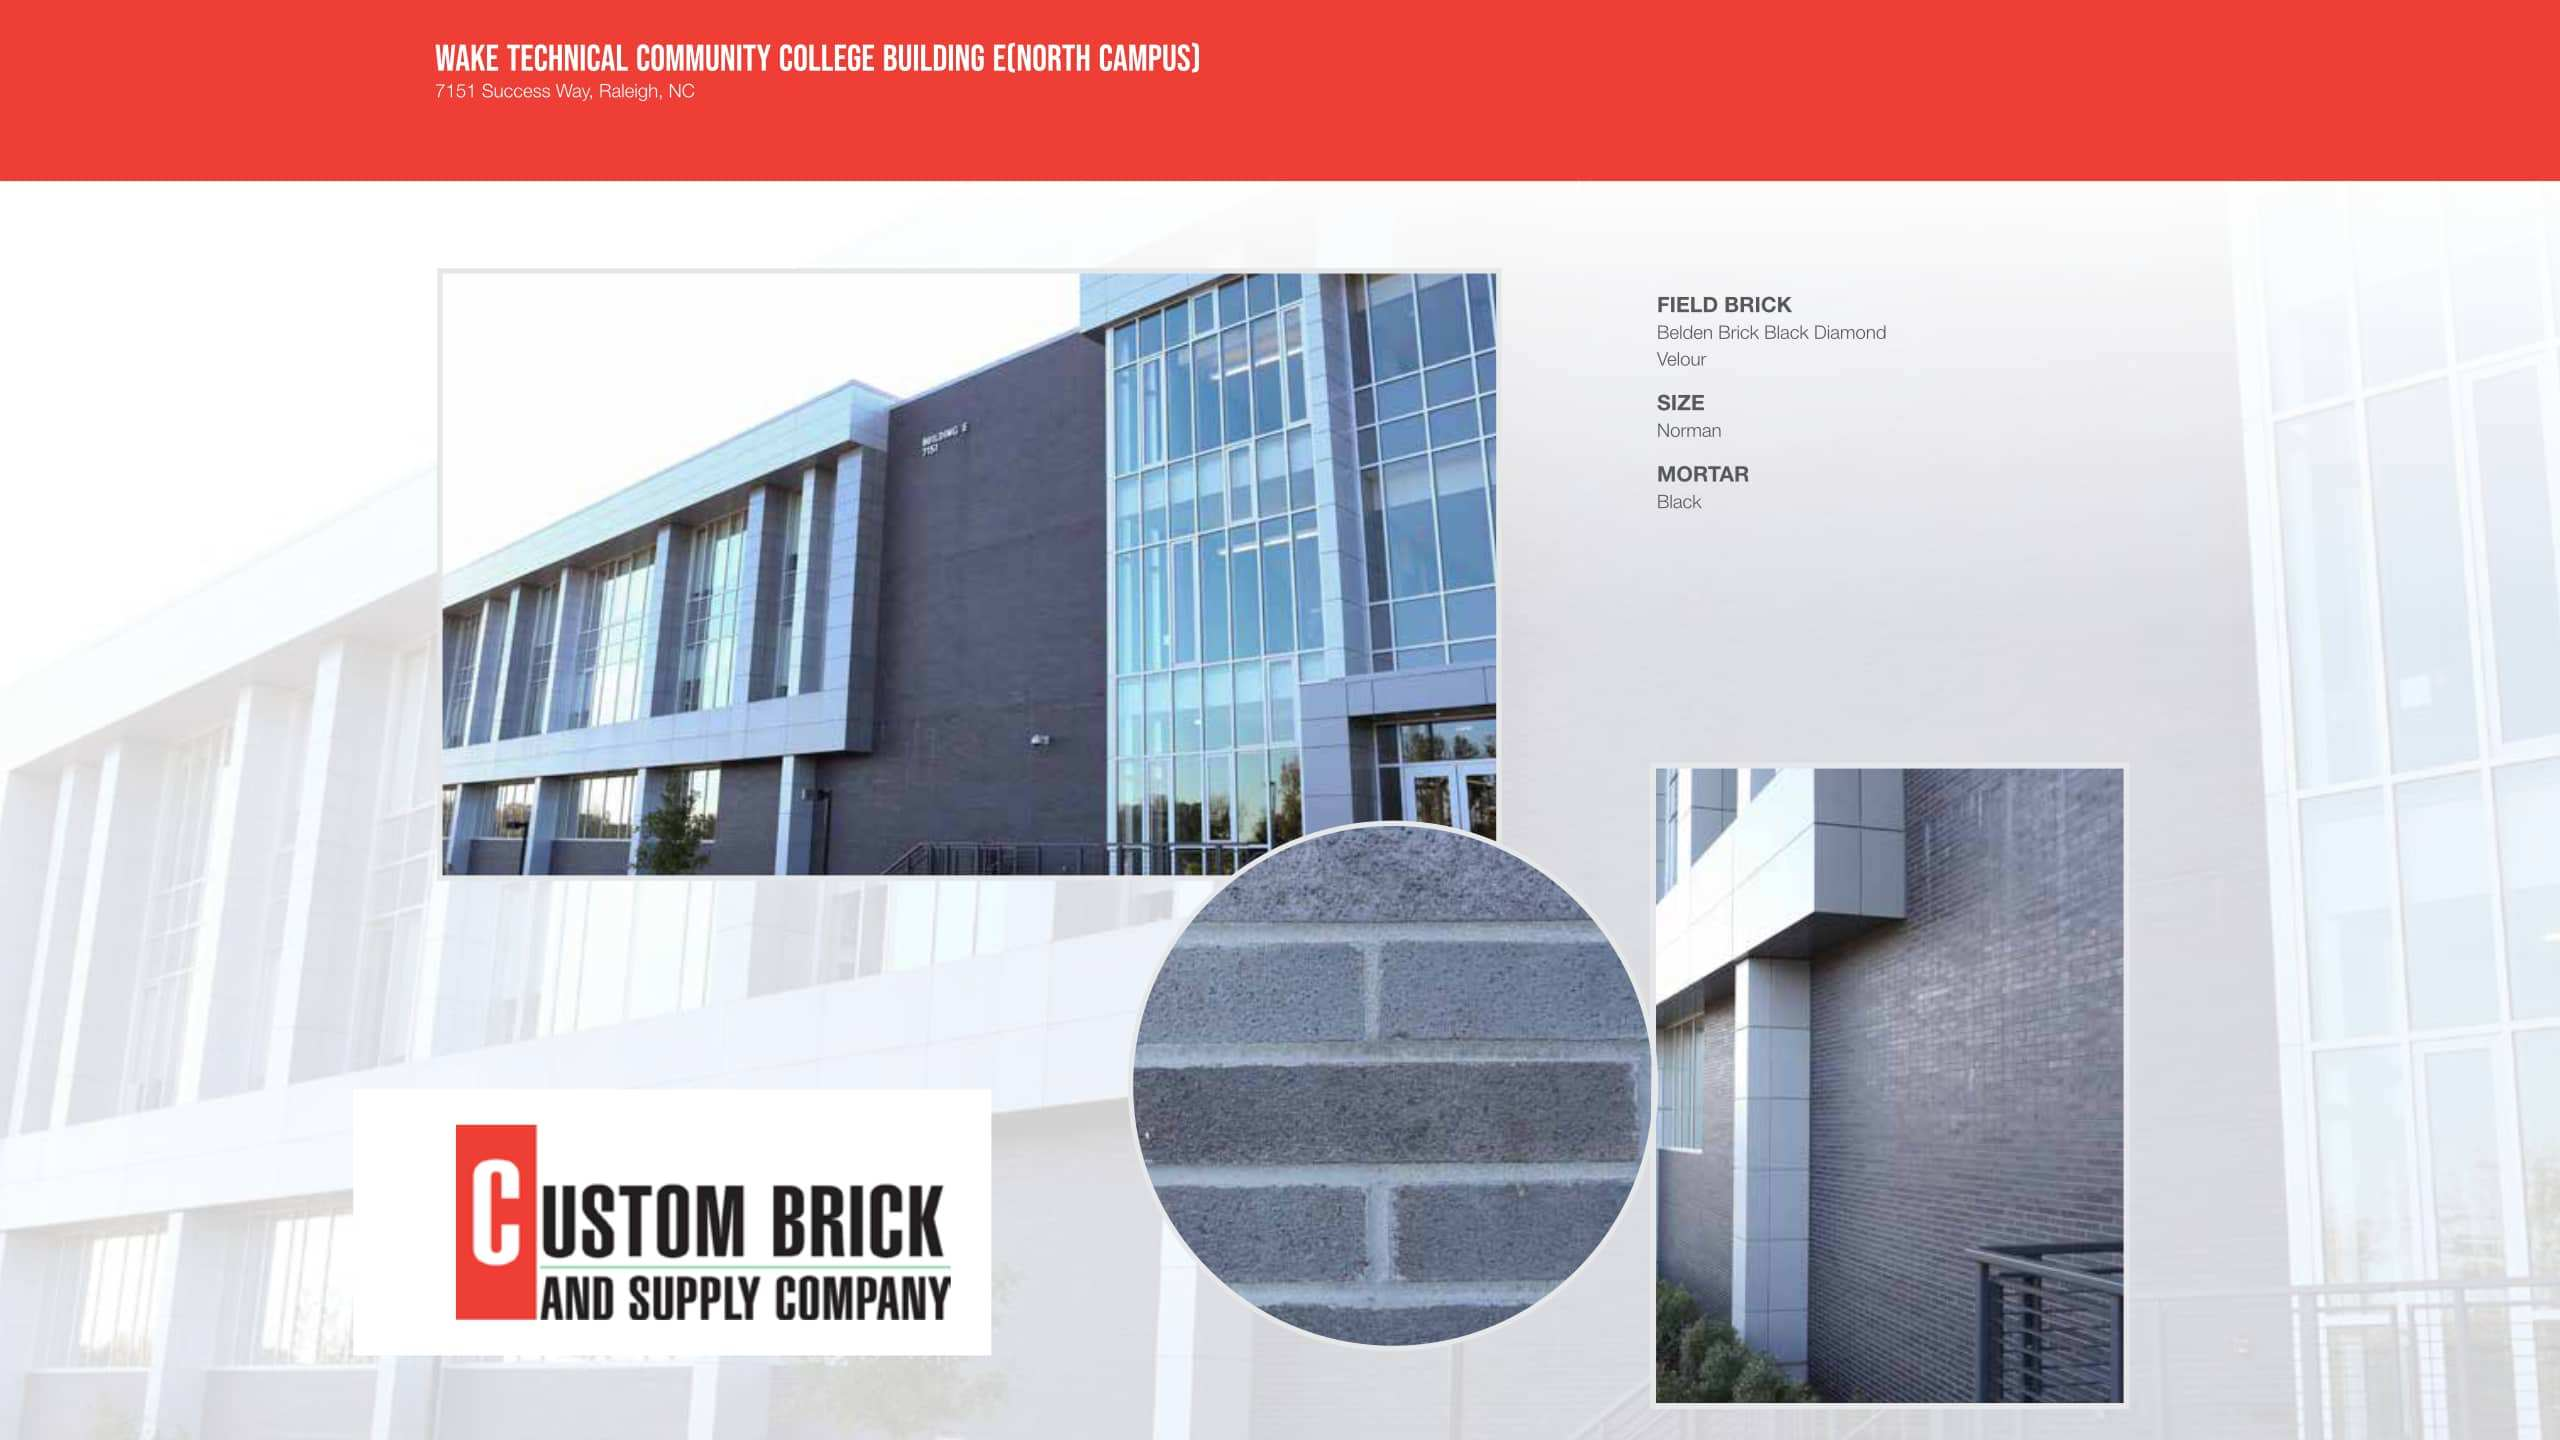 Custom Brick and Supply Company Case Study Placeholder Image